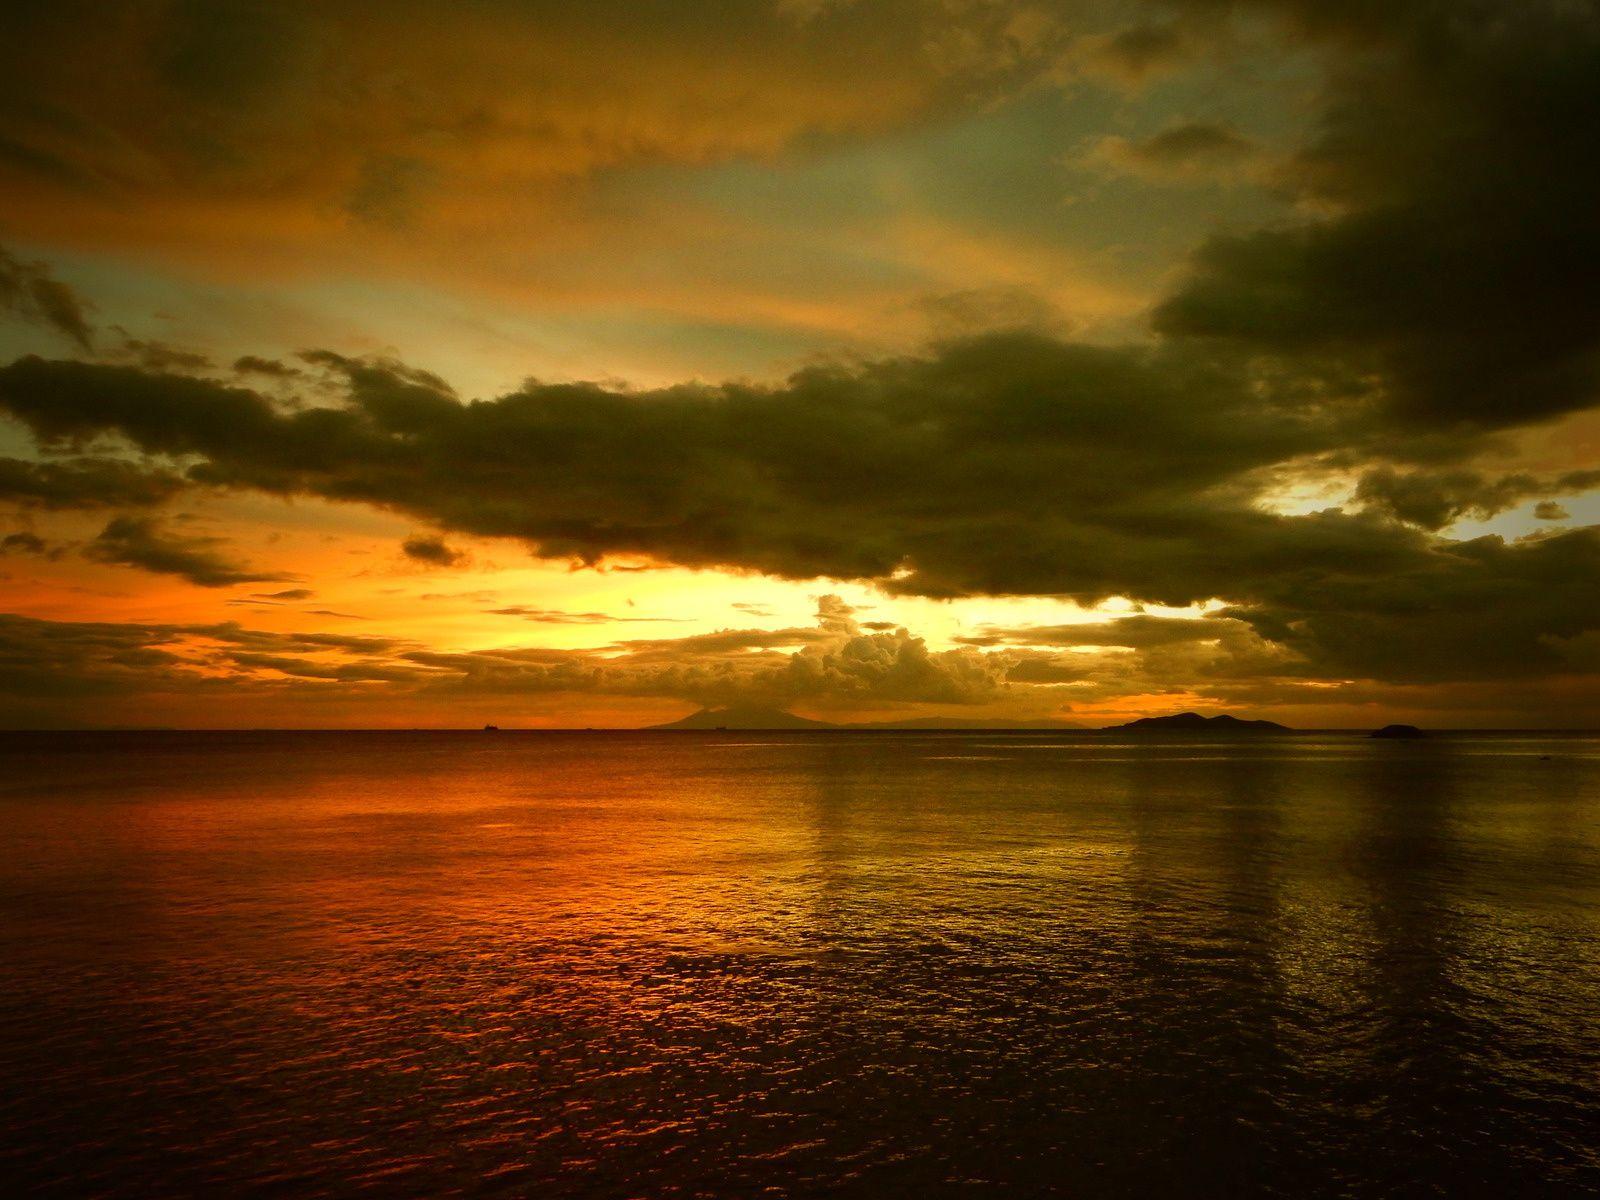 Essais Sunset view in Punta Fuego Peninsula - Octobre 2014